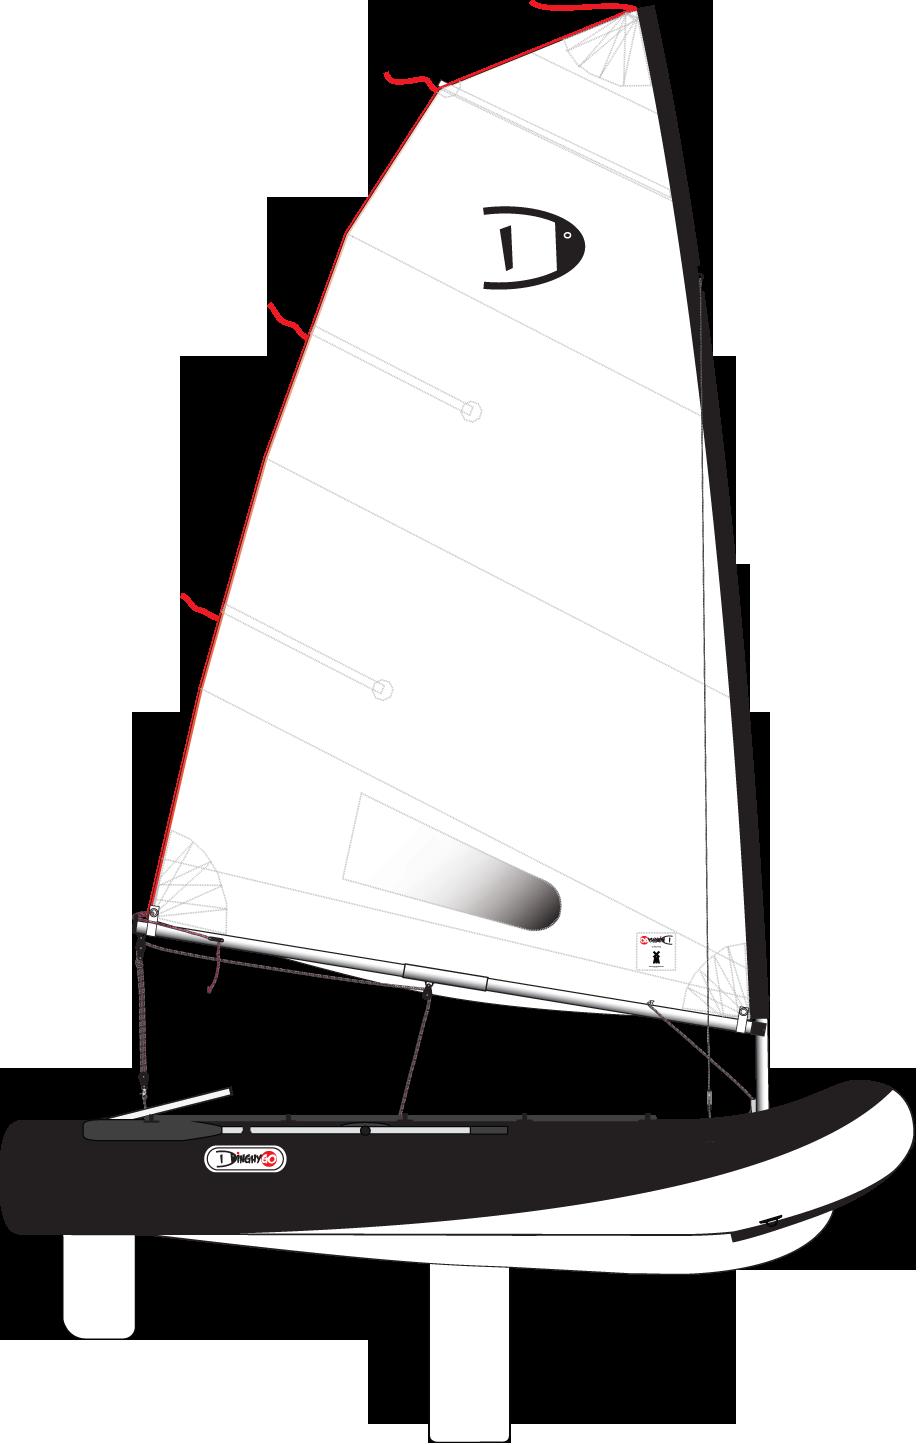 DinghyGo Orca (Reservierung Lieferung April 2019)